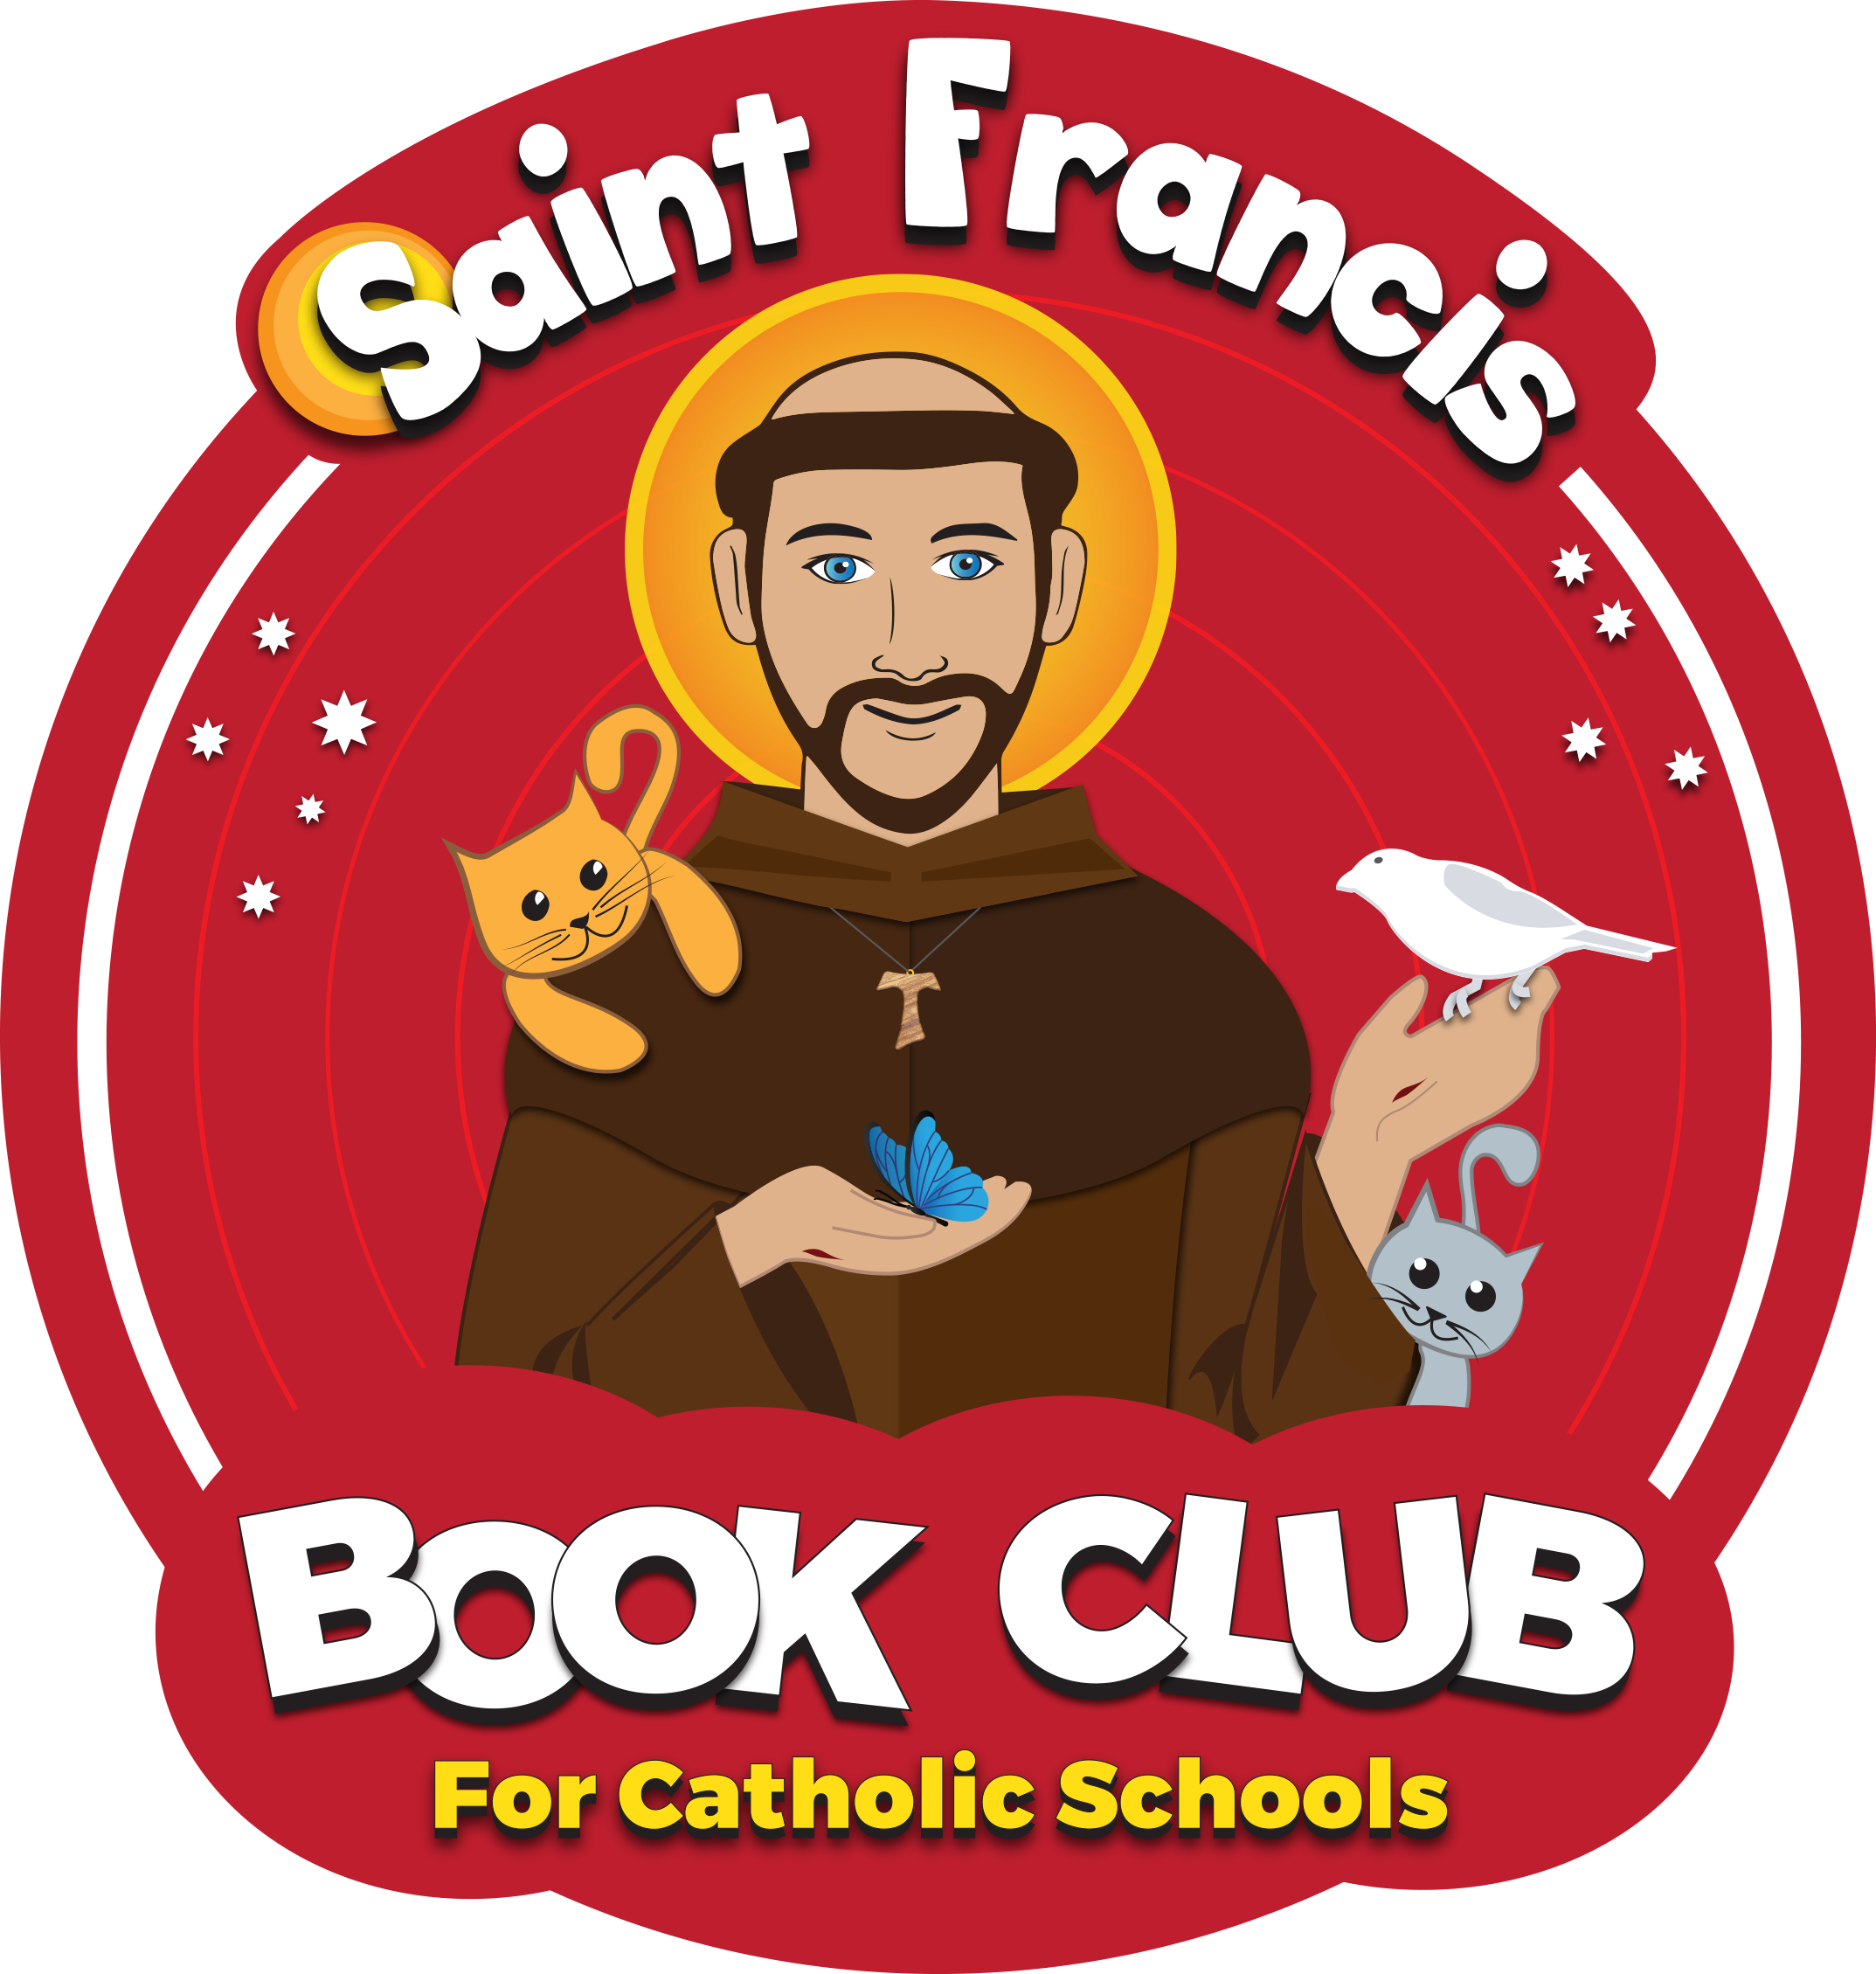 St Francis Book Cli=ub